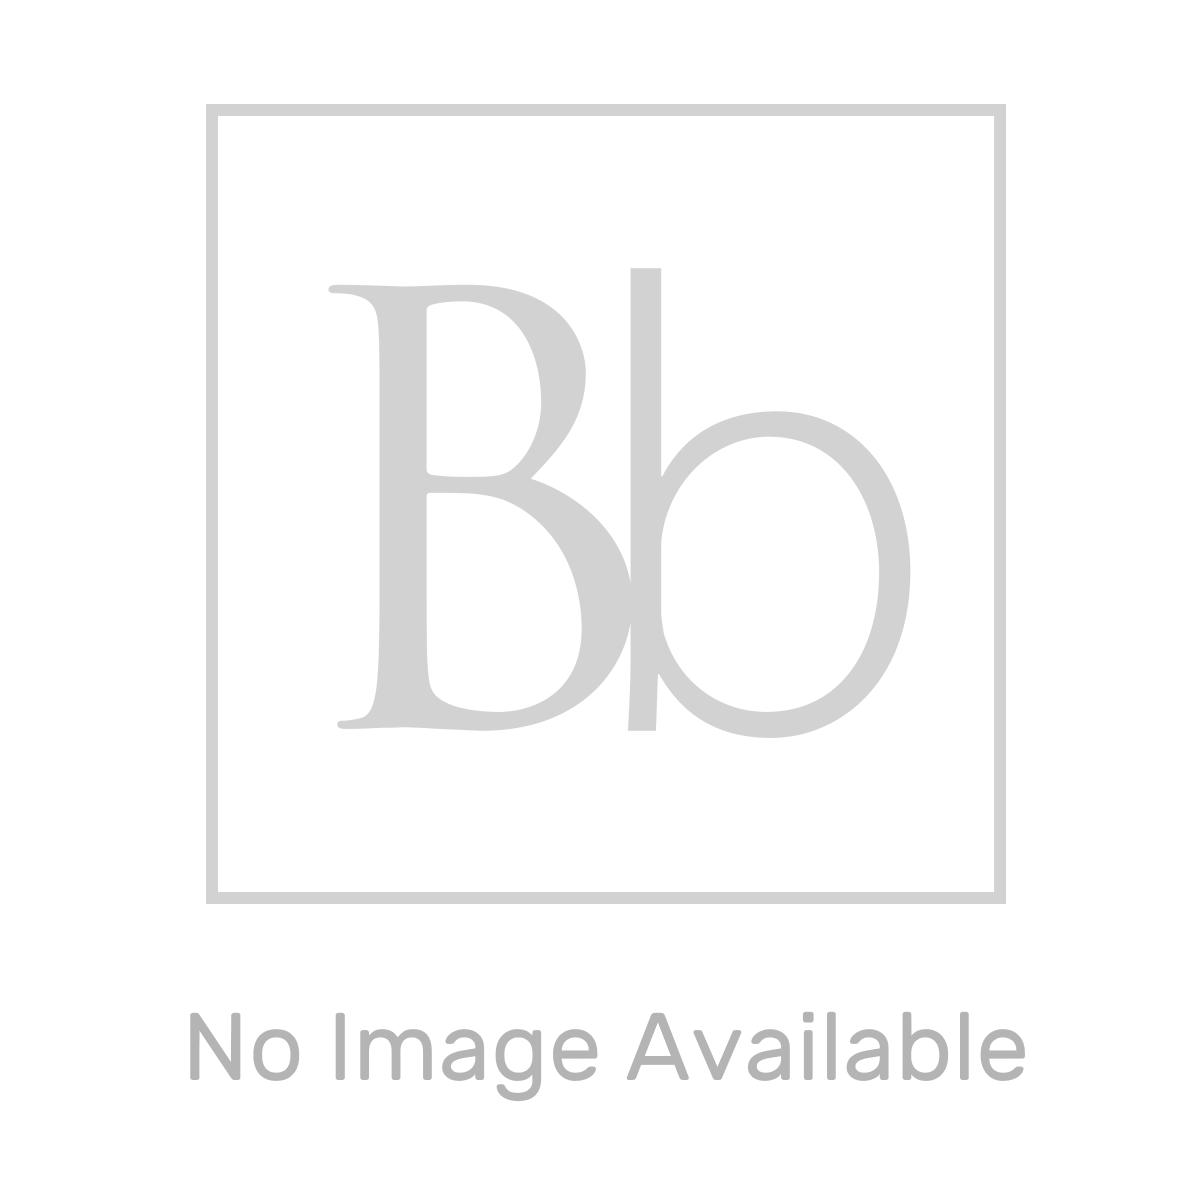 Frontline 4 x LED Bathroom Plinth Lighting Line Drawing